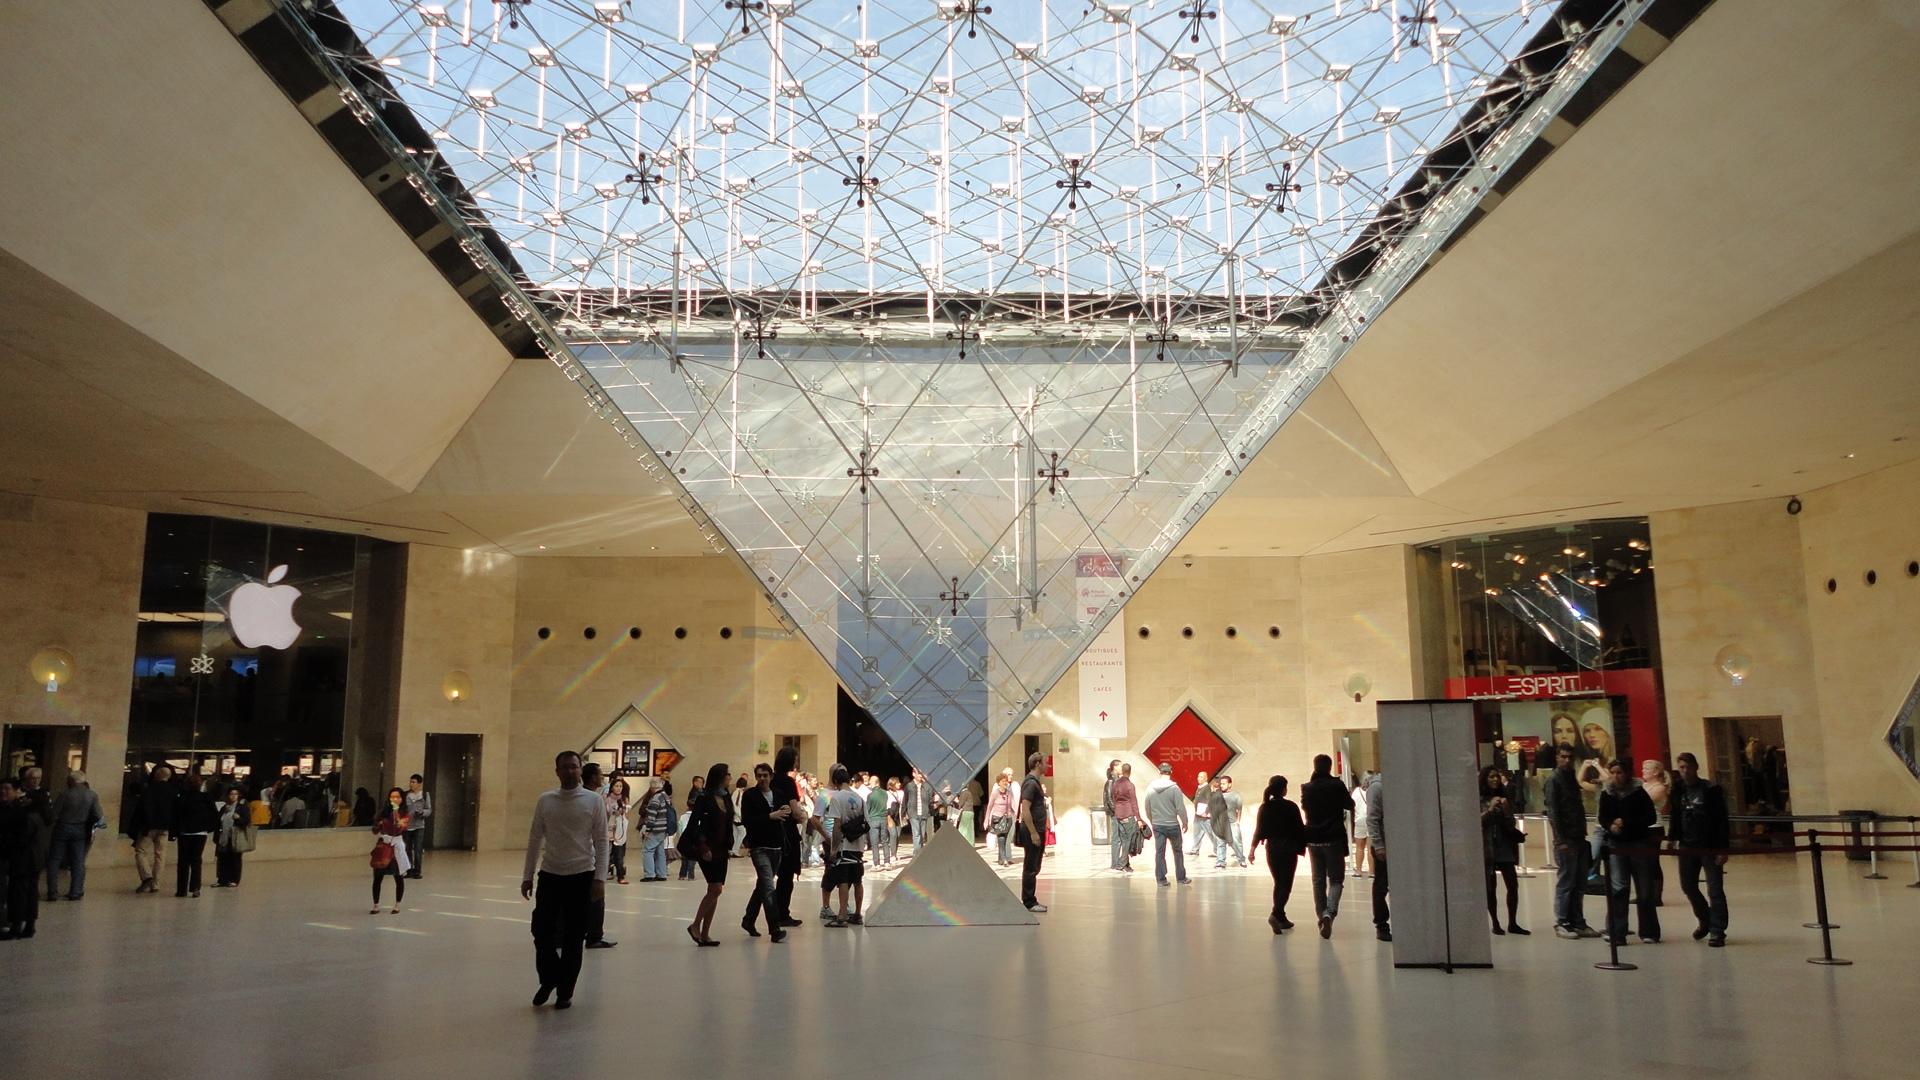 Inverse Pyramid, Louvre Museum